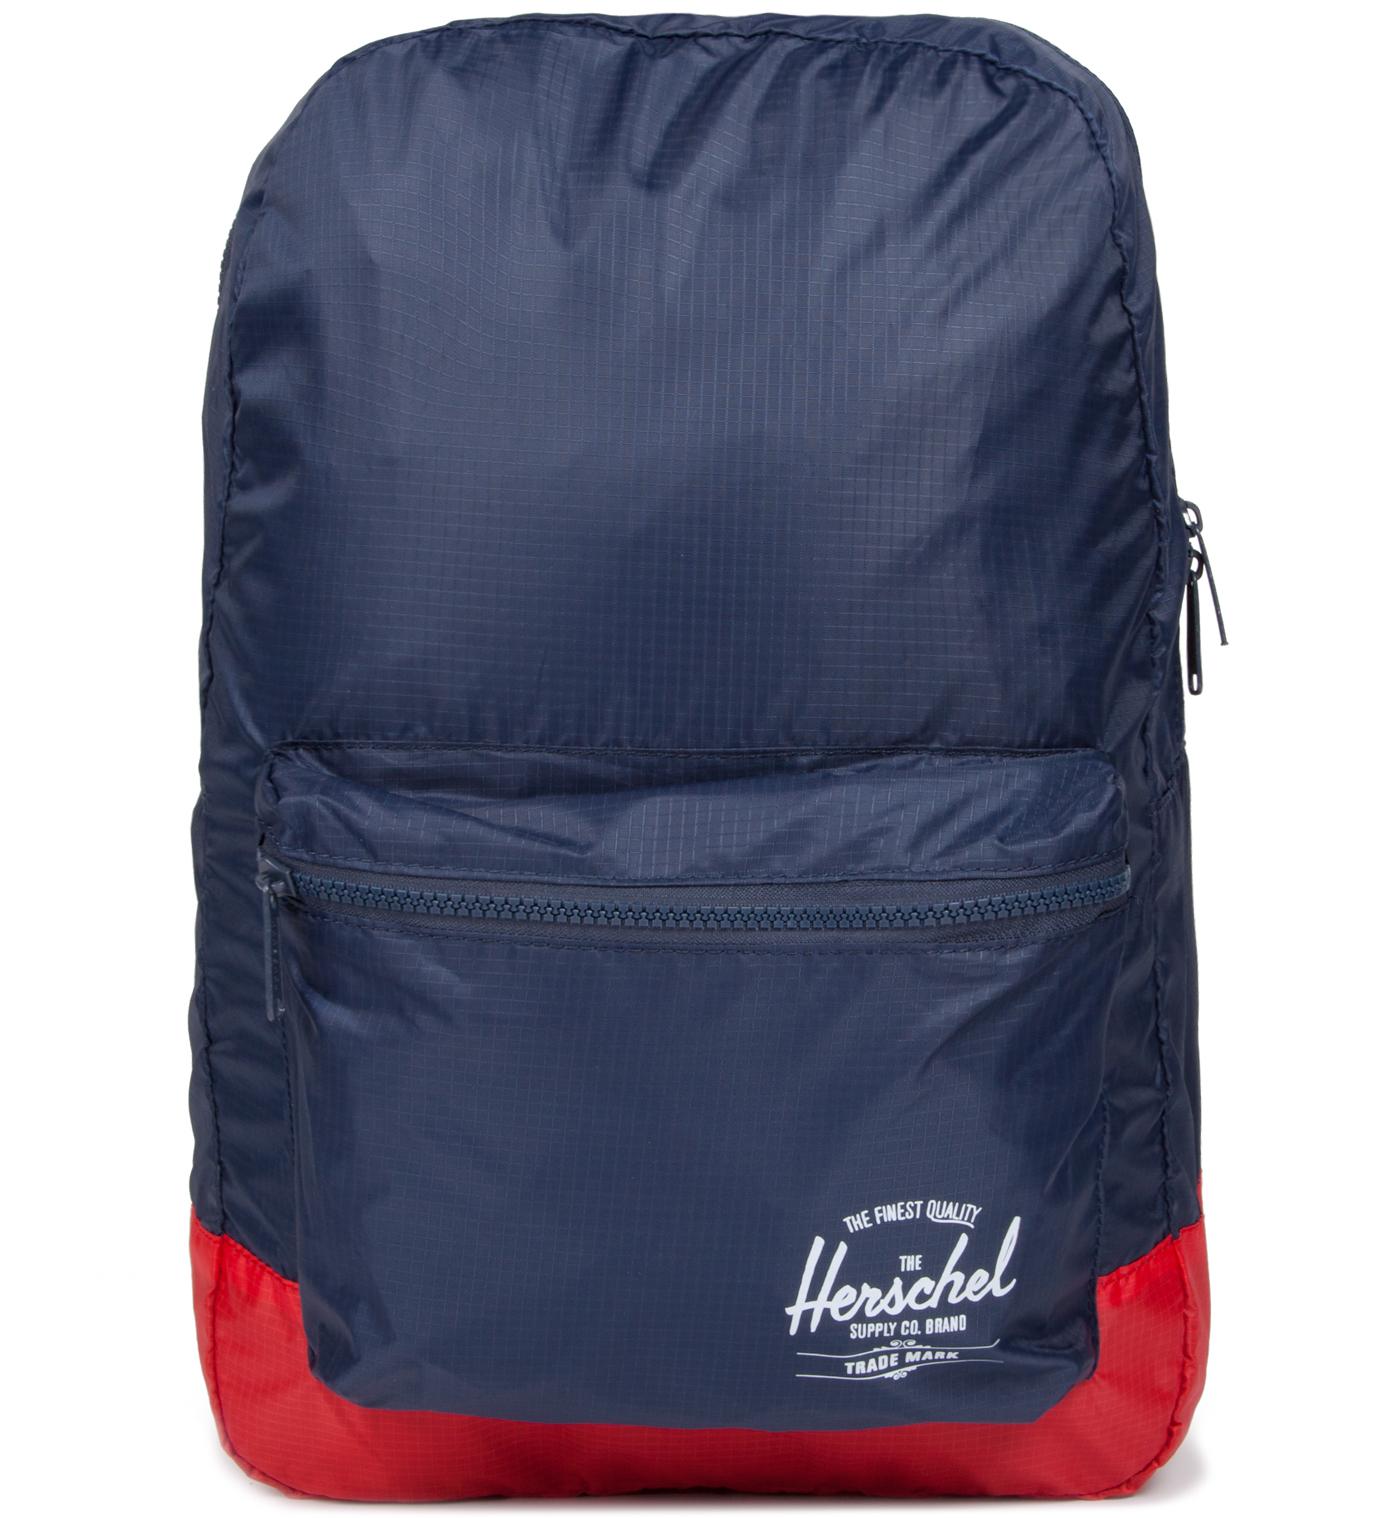 Herschel Supply Co. Navy/Red Packable Daypack